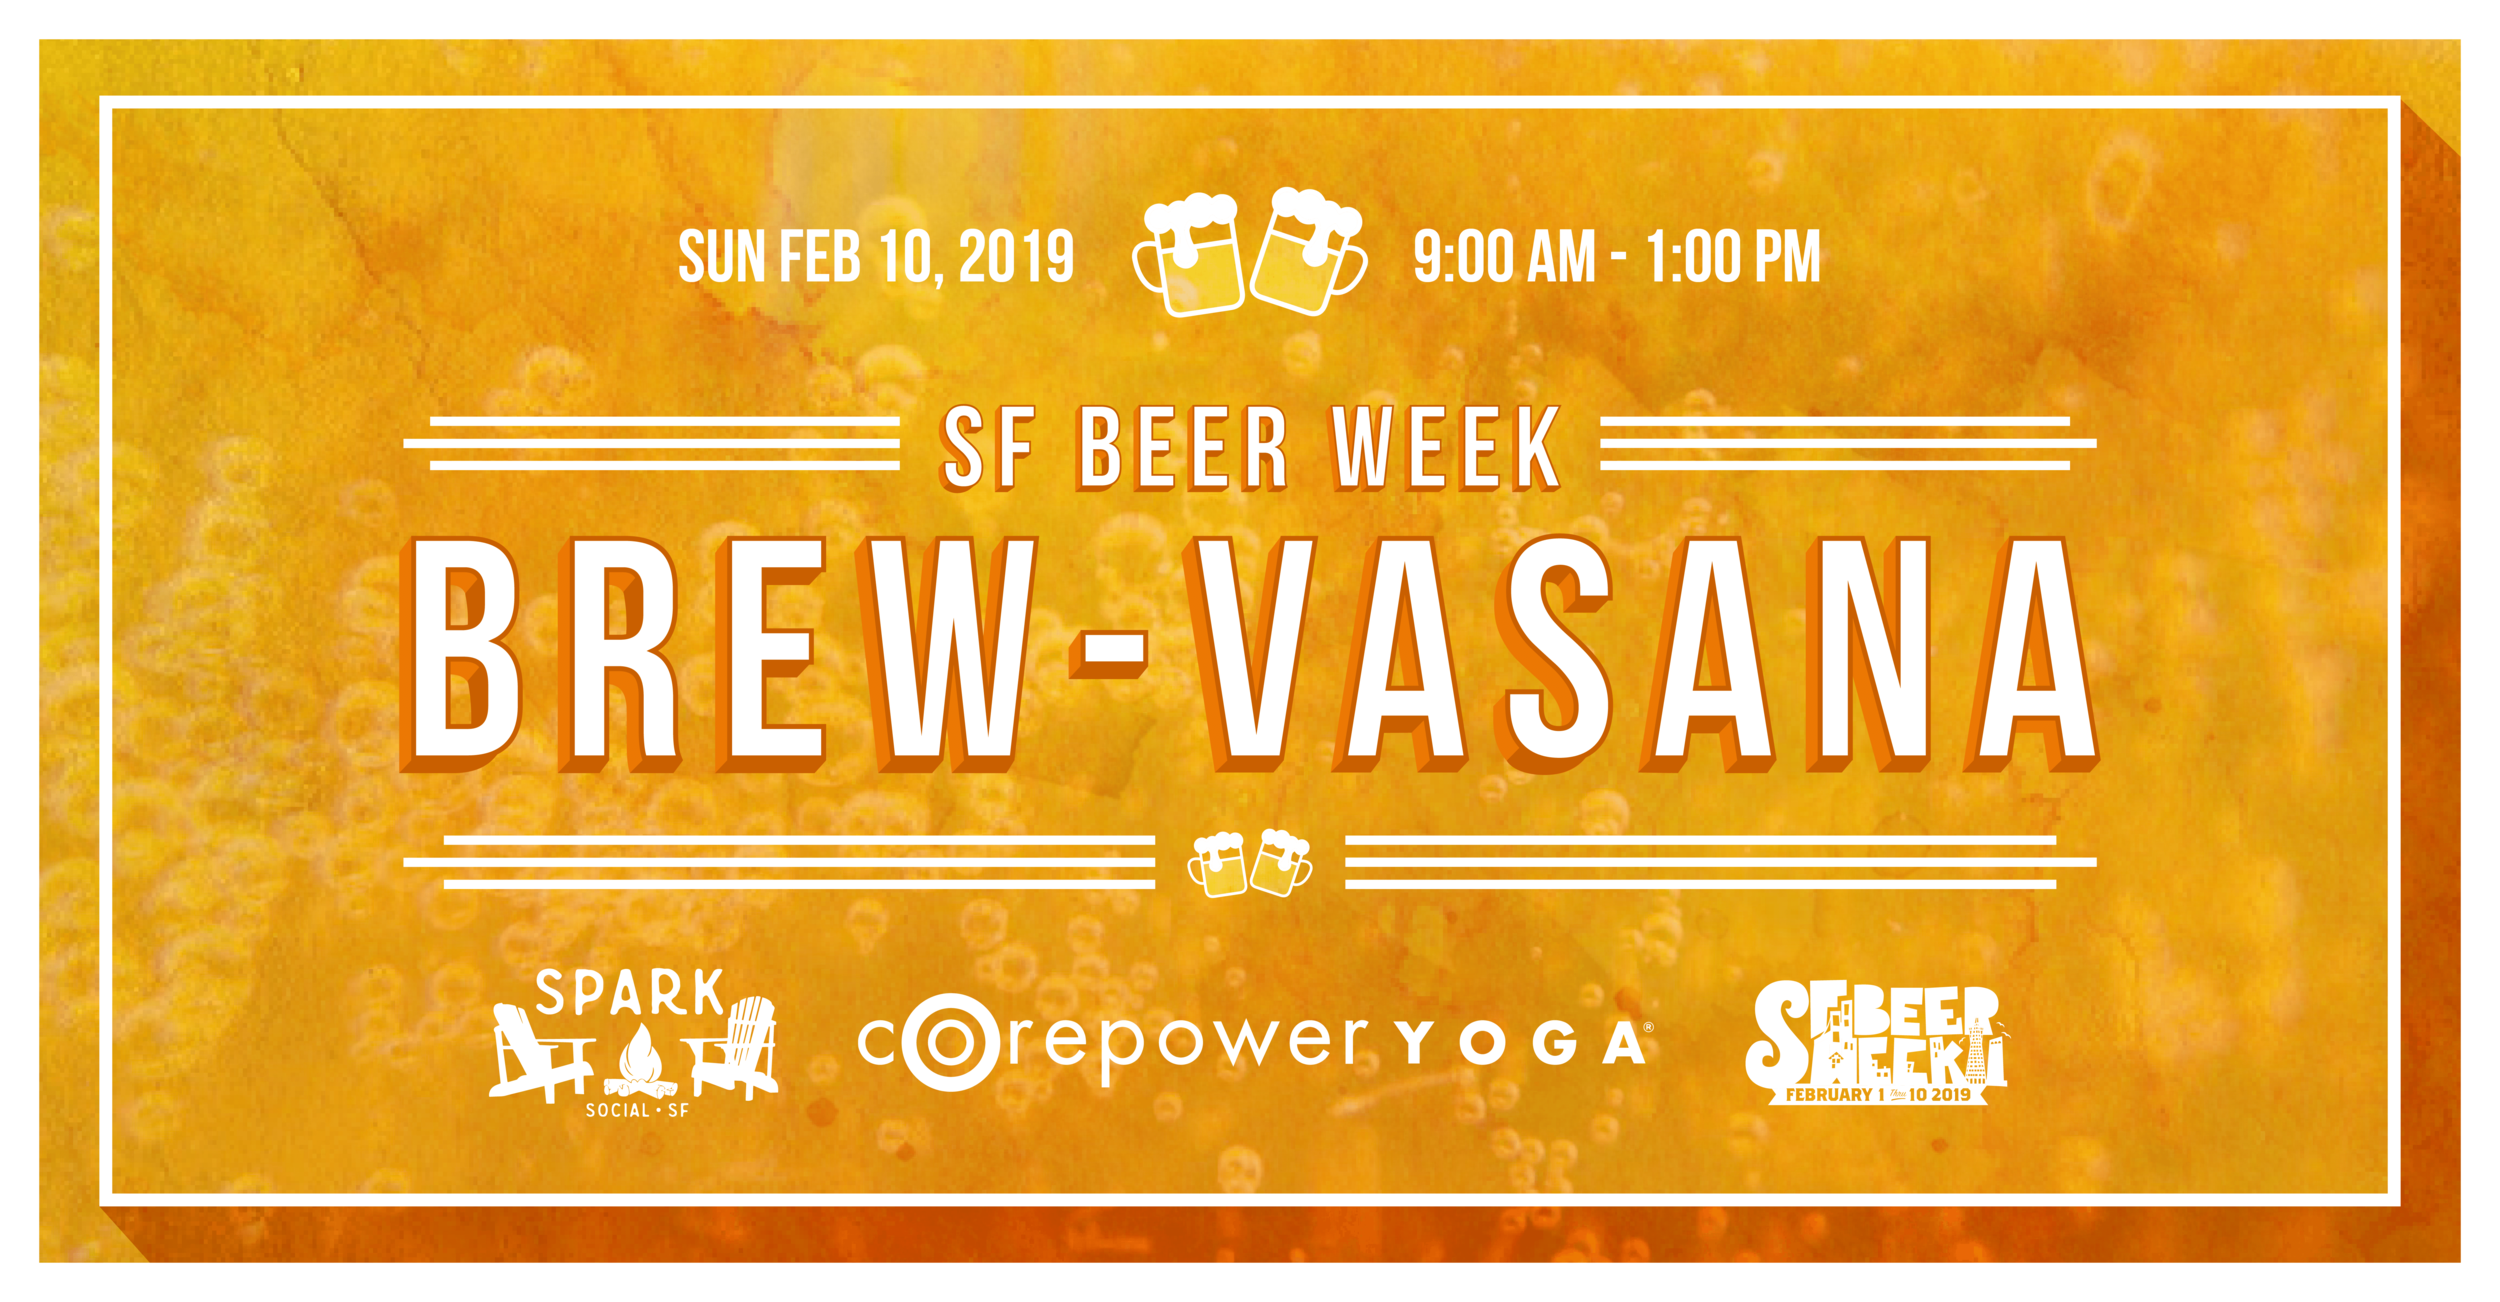 brewvasana-event-17jan-01 (1).png